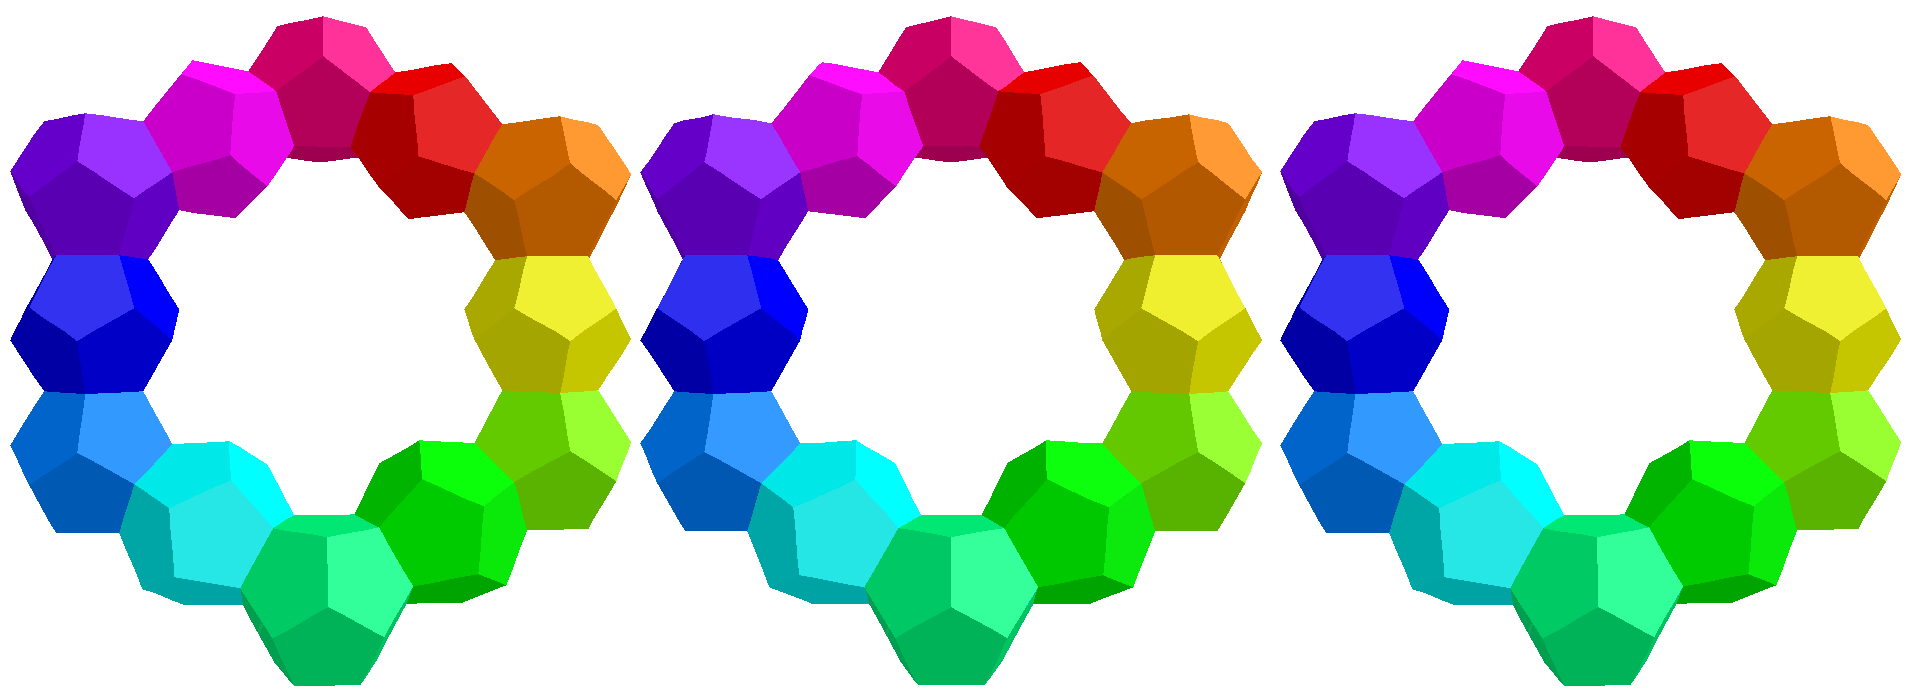 610_dodecahedron_uspHxgPck_00_D300.png